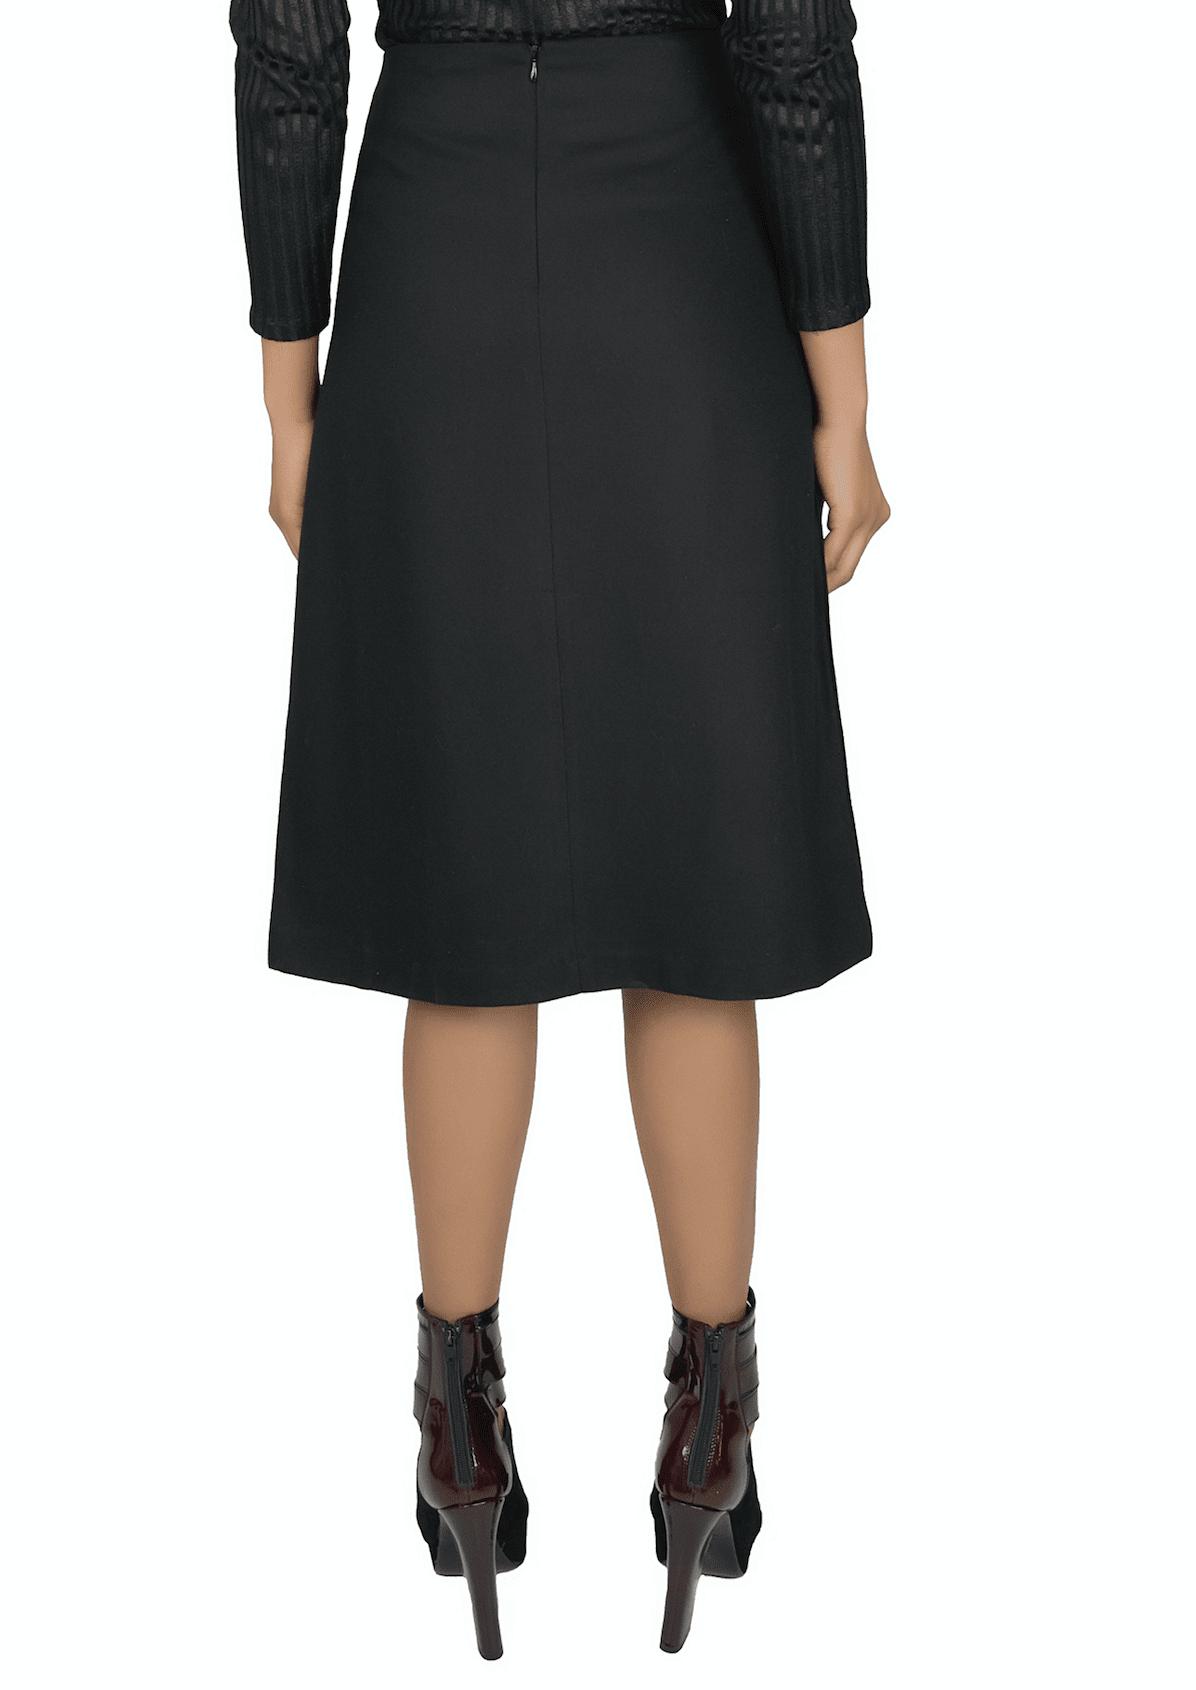 Skirt LARAWAG 3